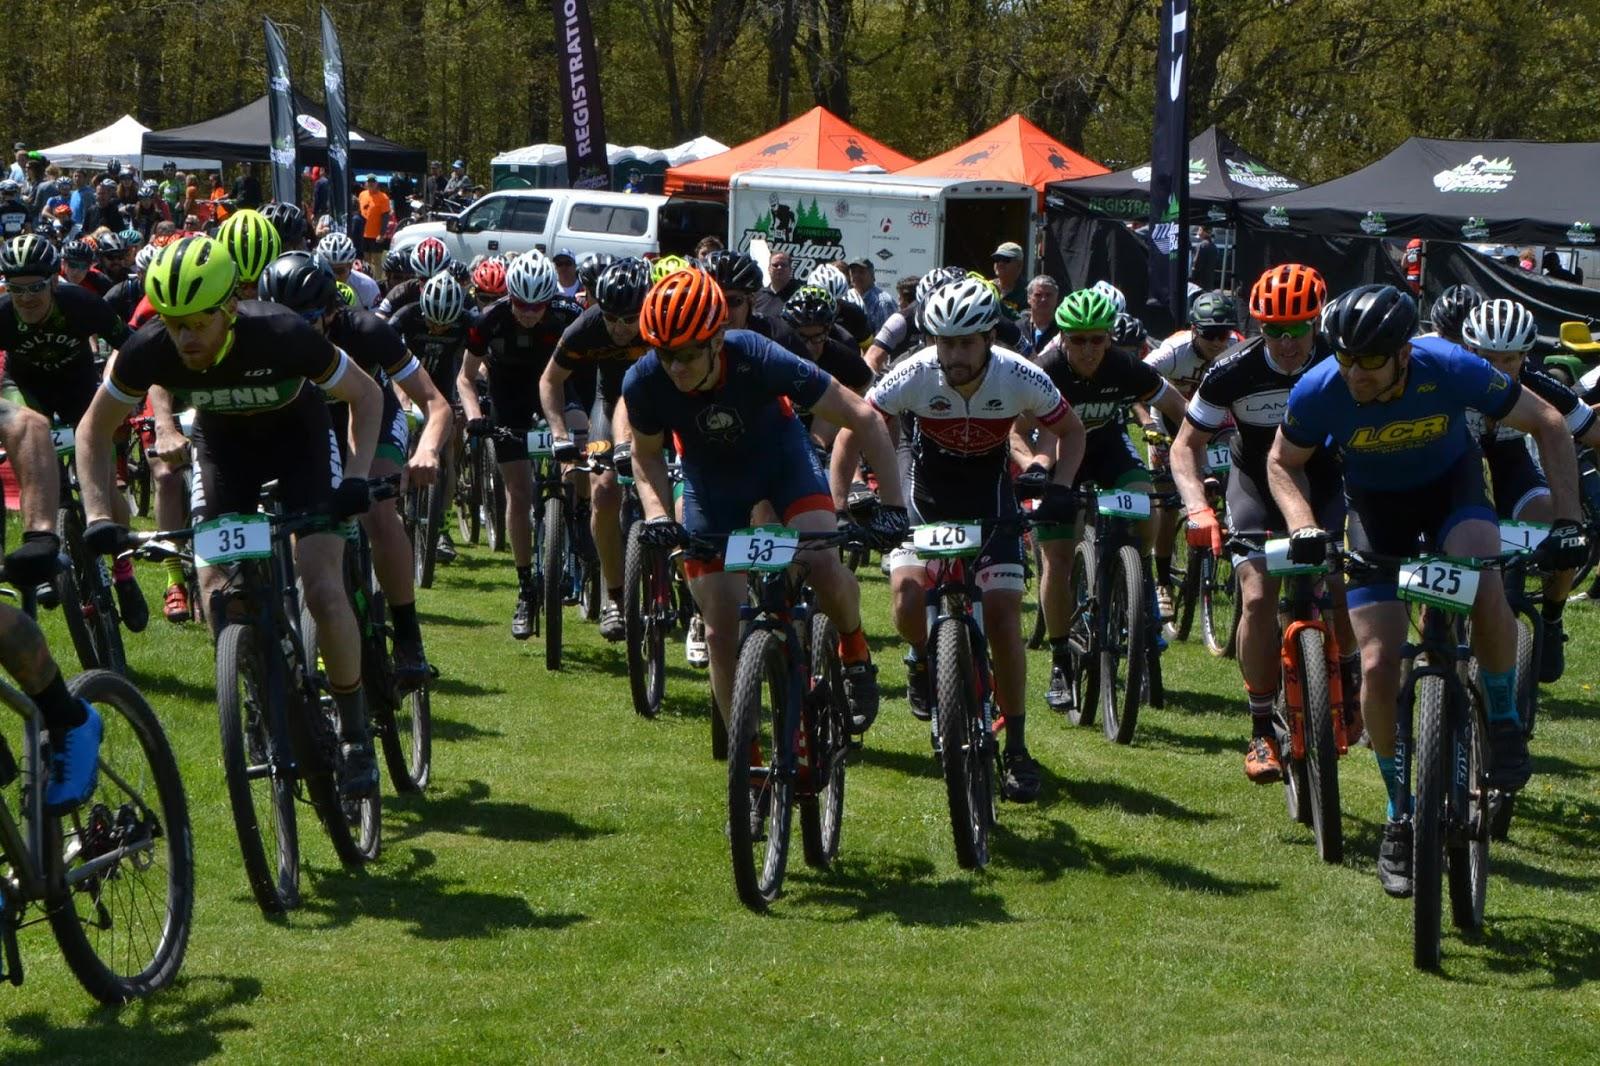 Cyclova Xc Mountain Bike Race Series Opener Draws 600 Bike Racers